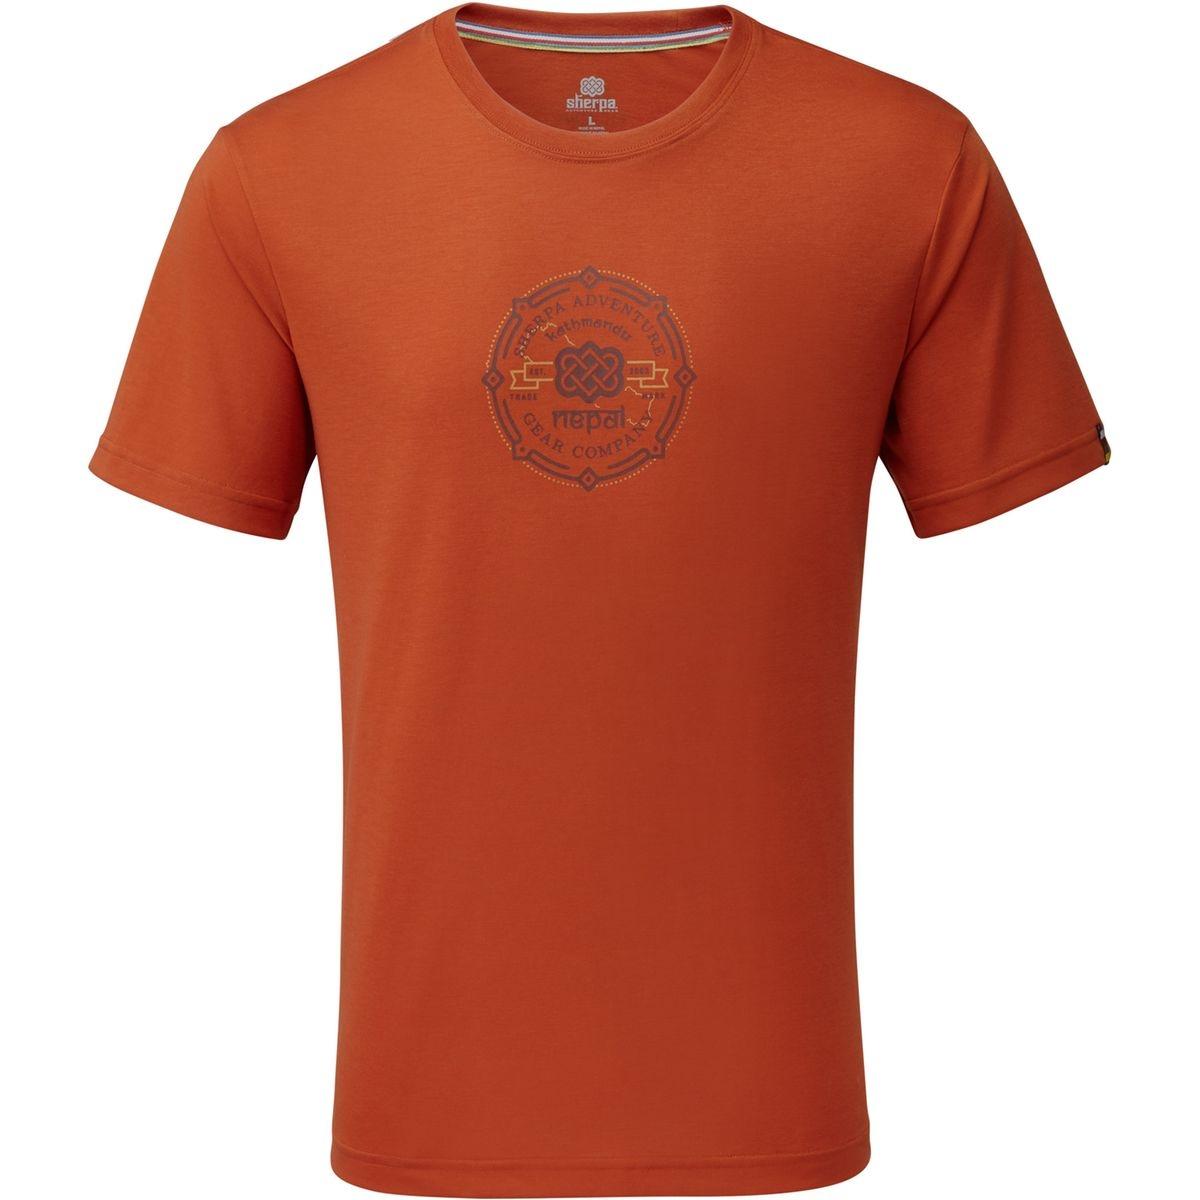 Kimti - T-shirt manches courtes Homme - orange